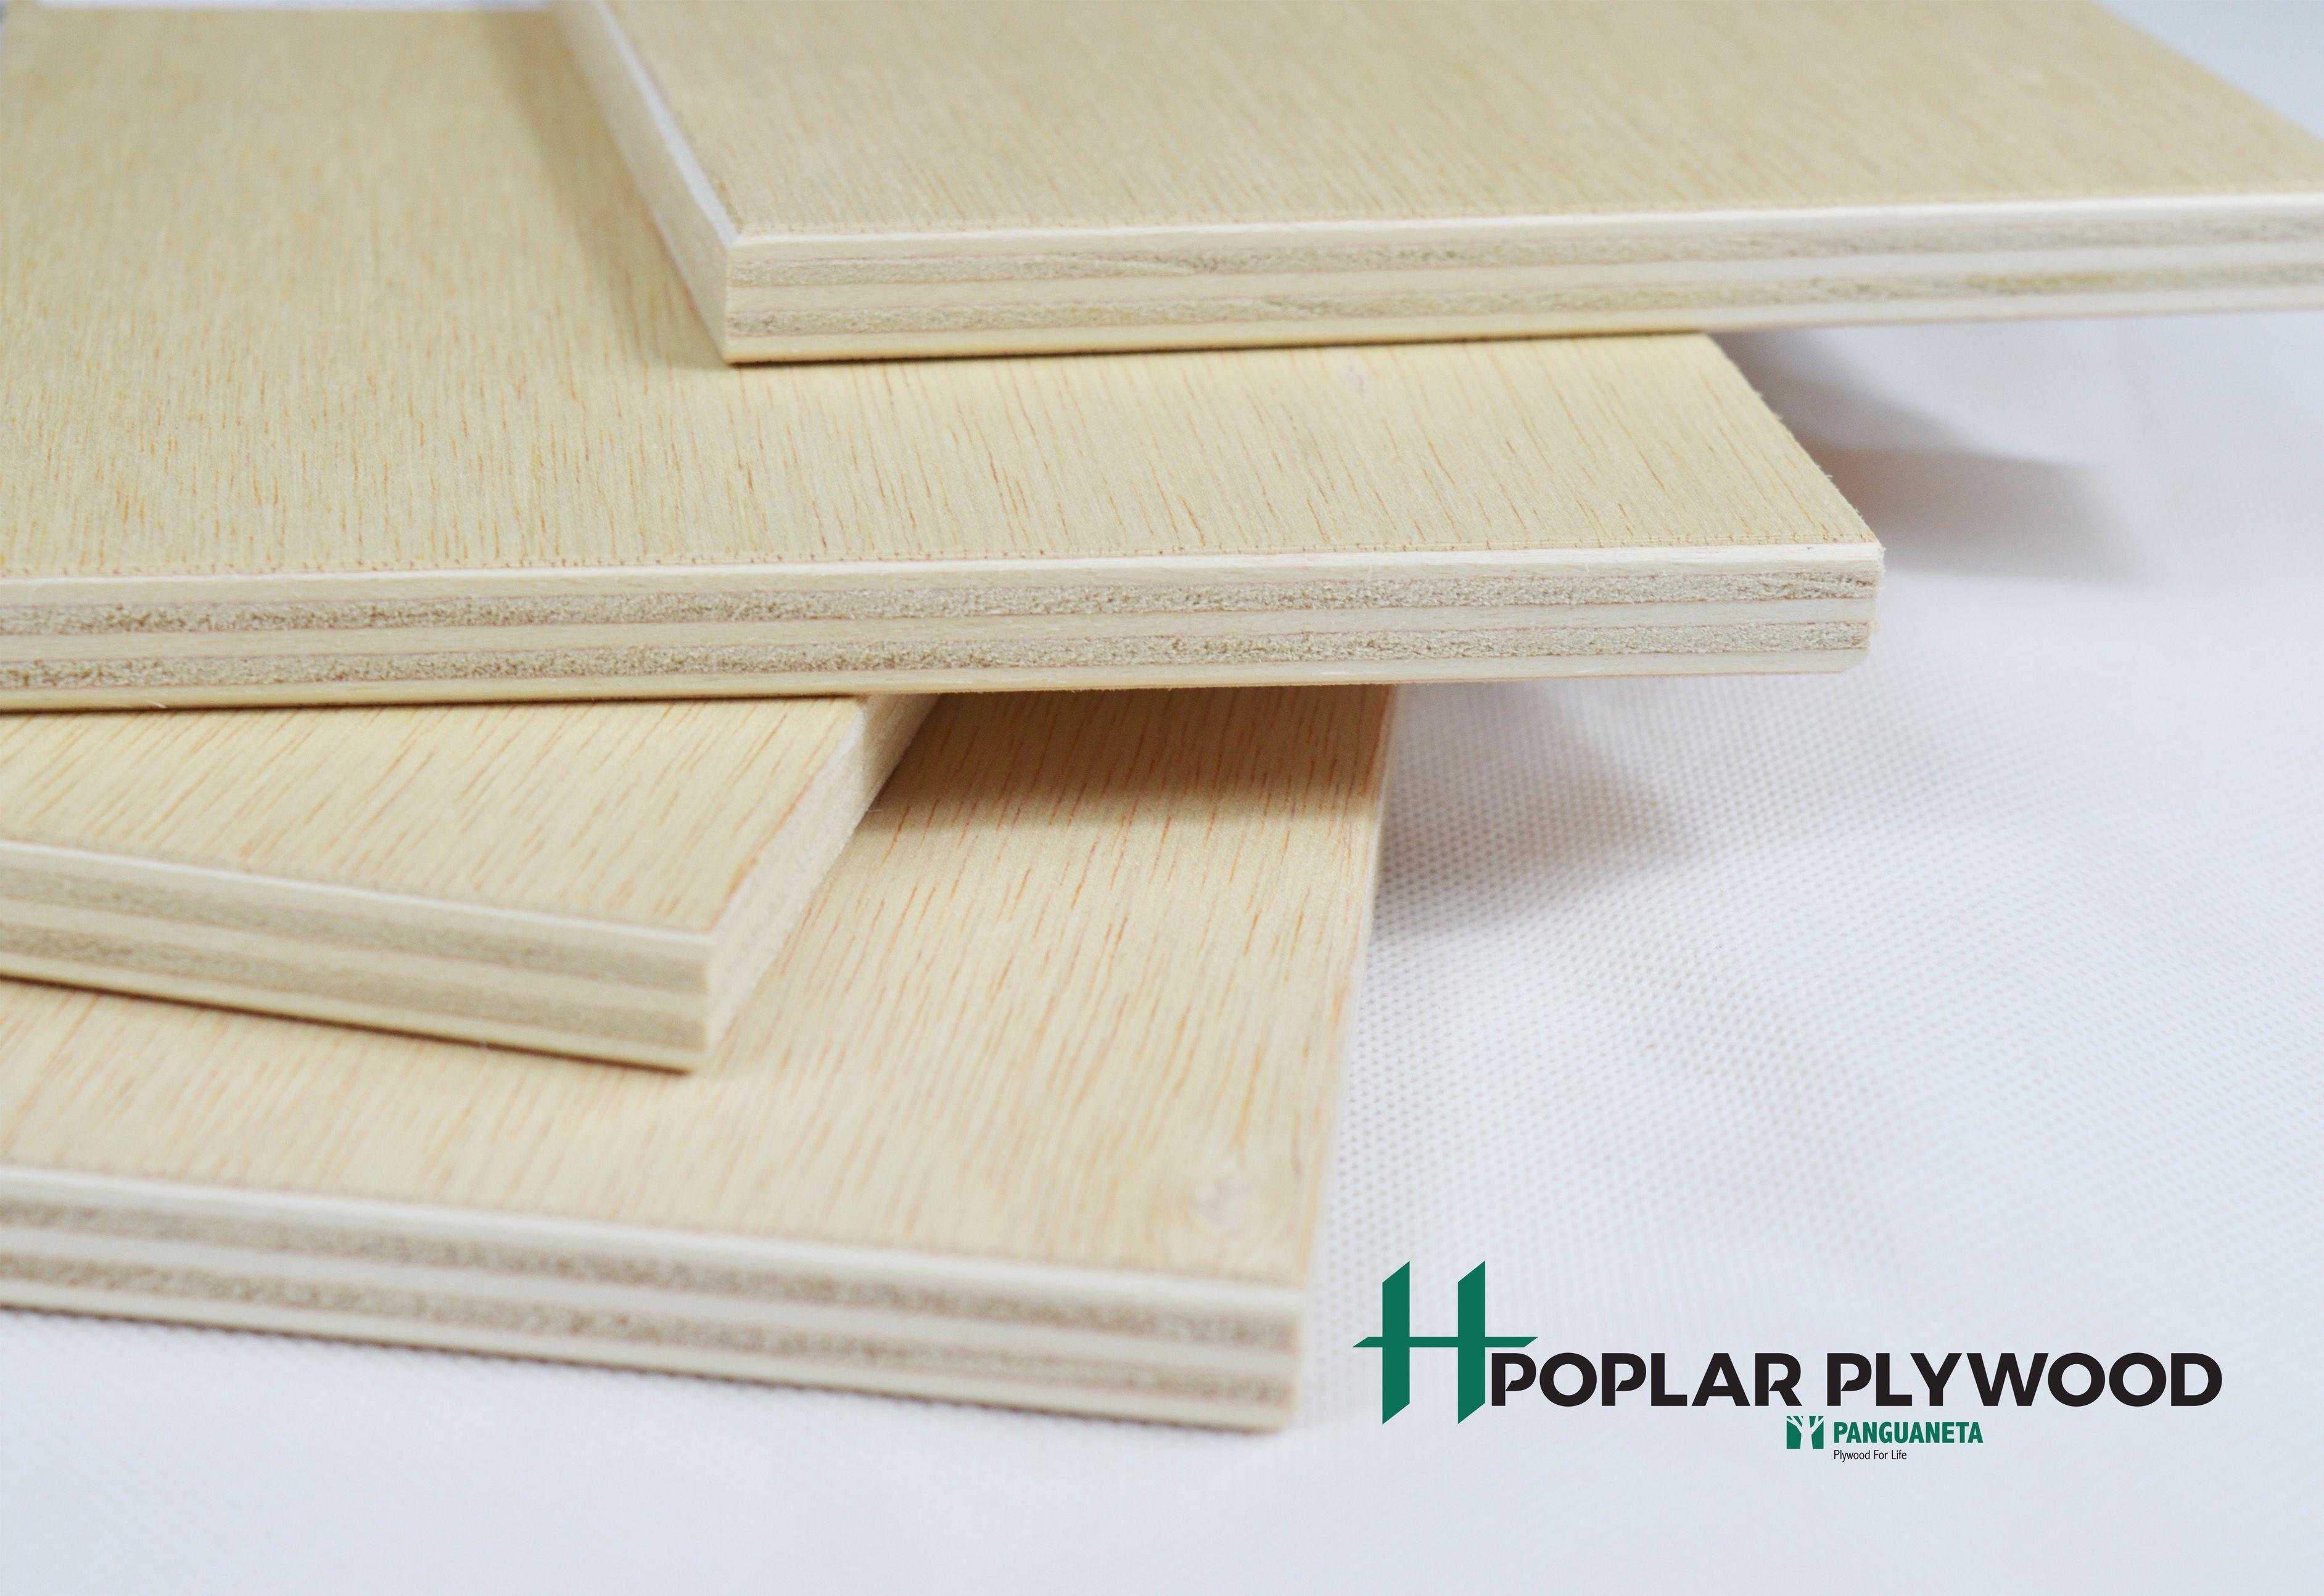 Product: Ilomba Faced Poplar Plywood